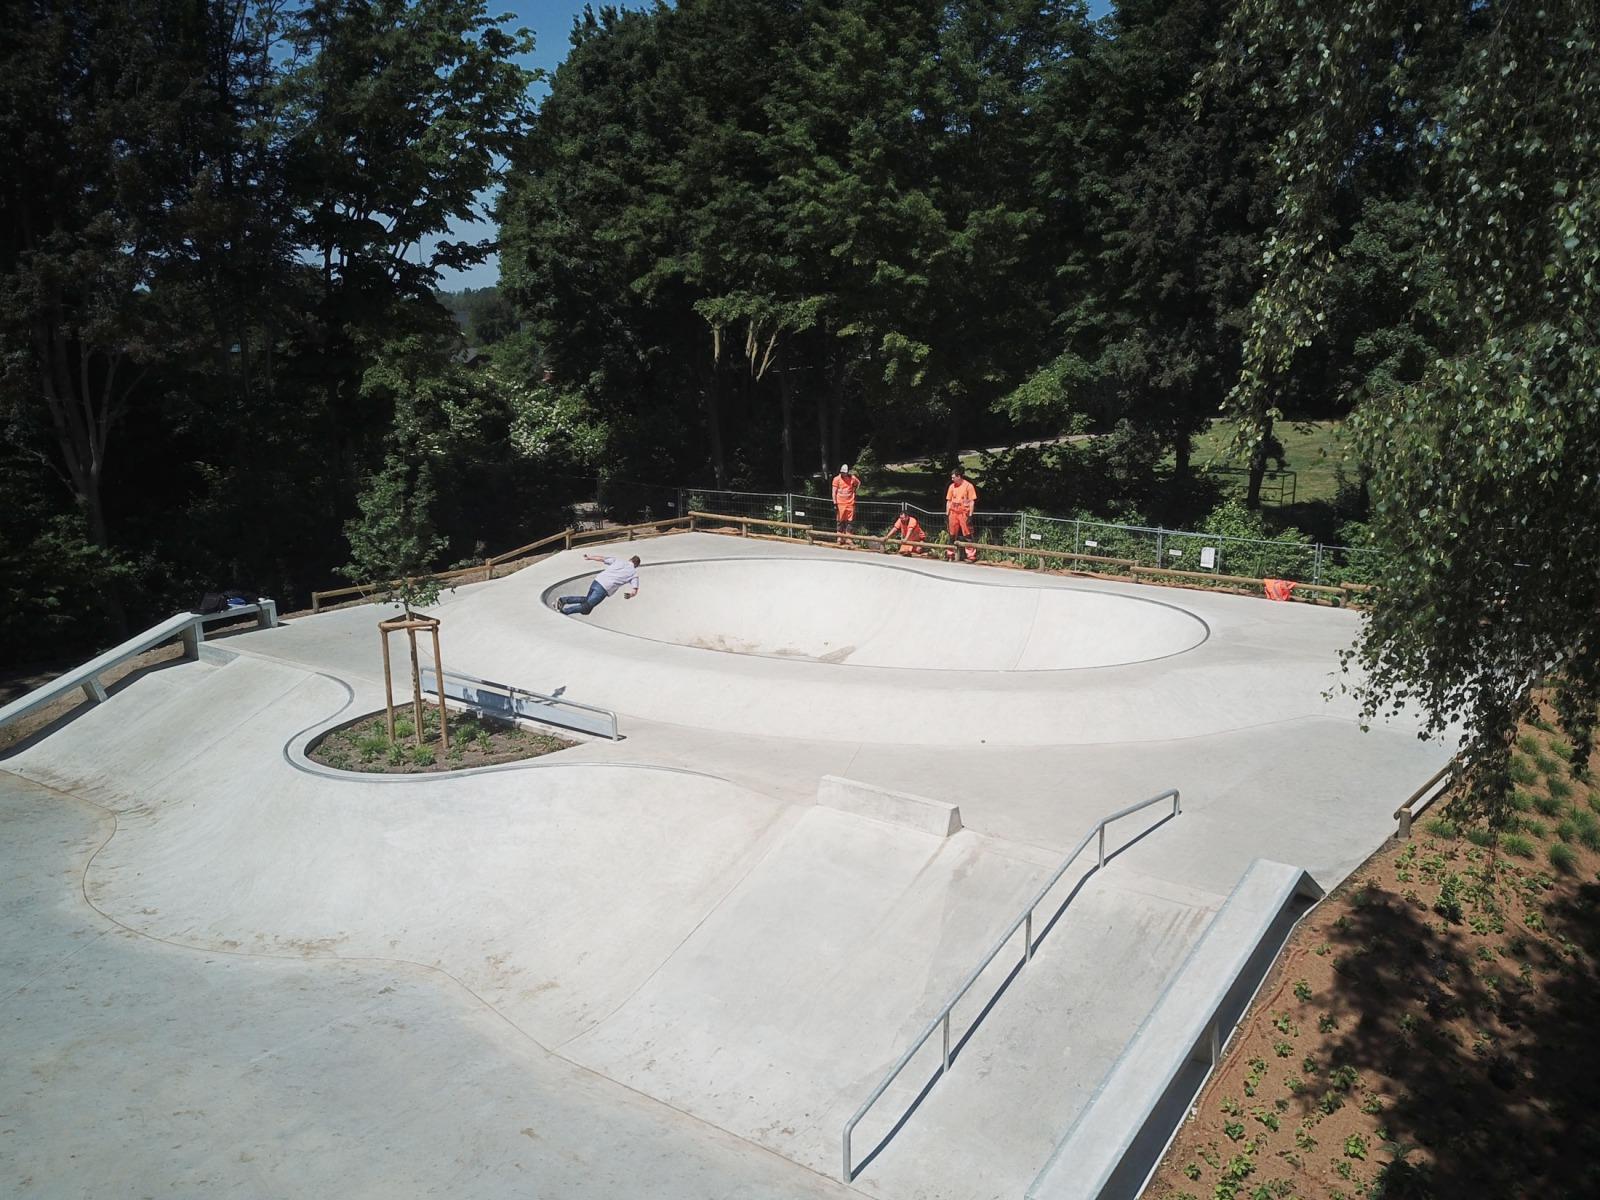 Skatepark_Sonsbeck_05.20_04